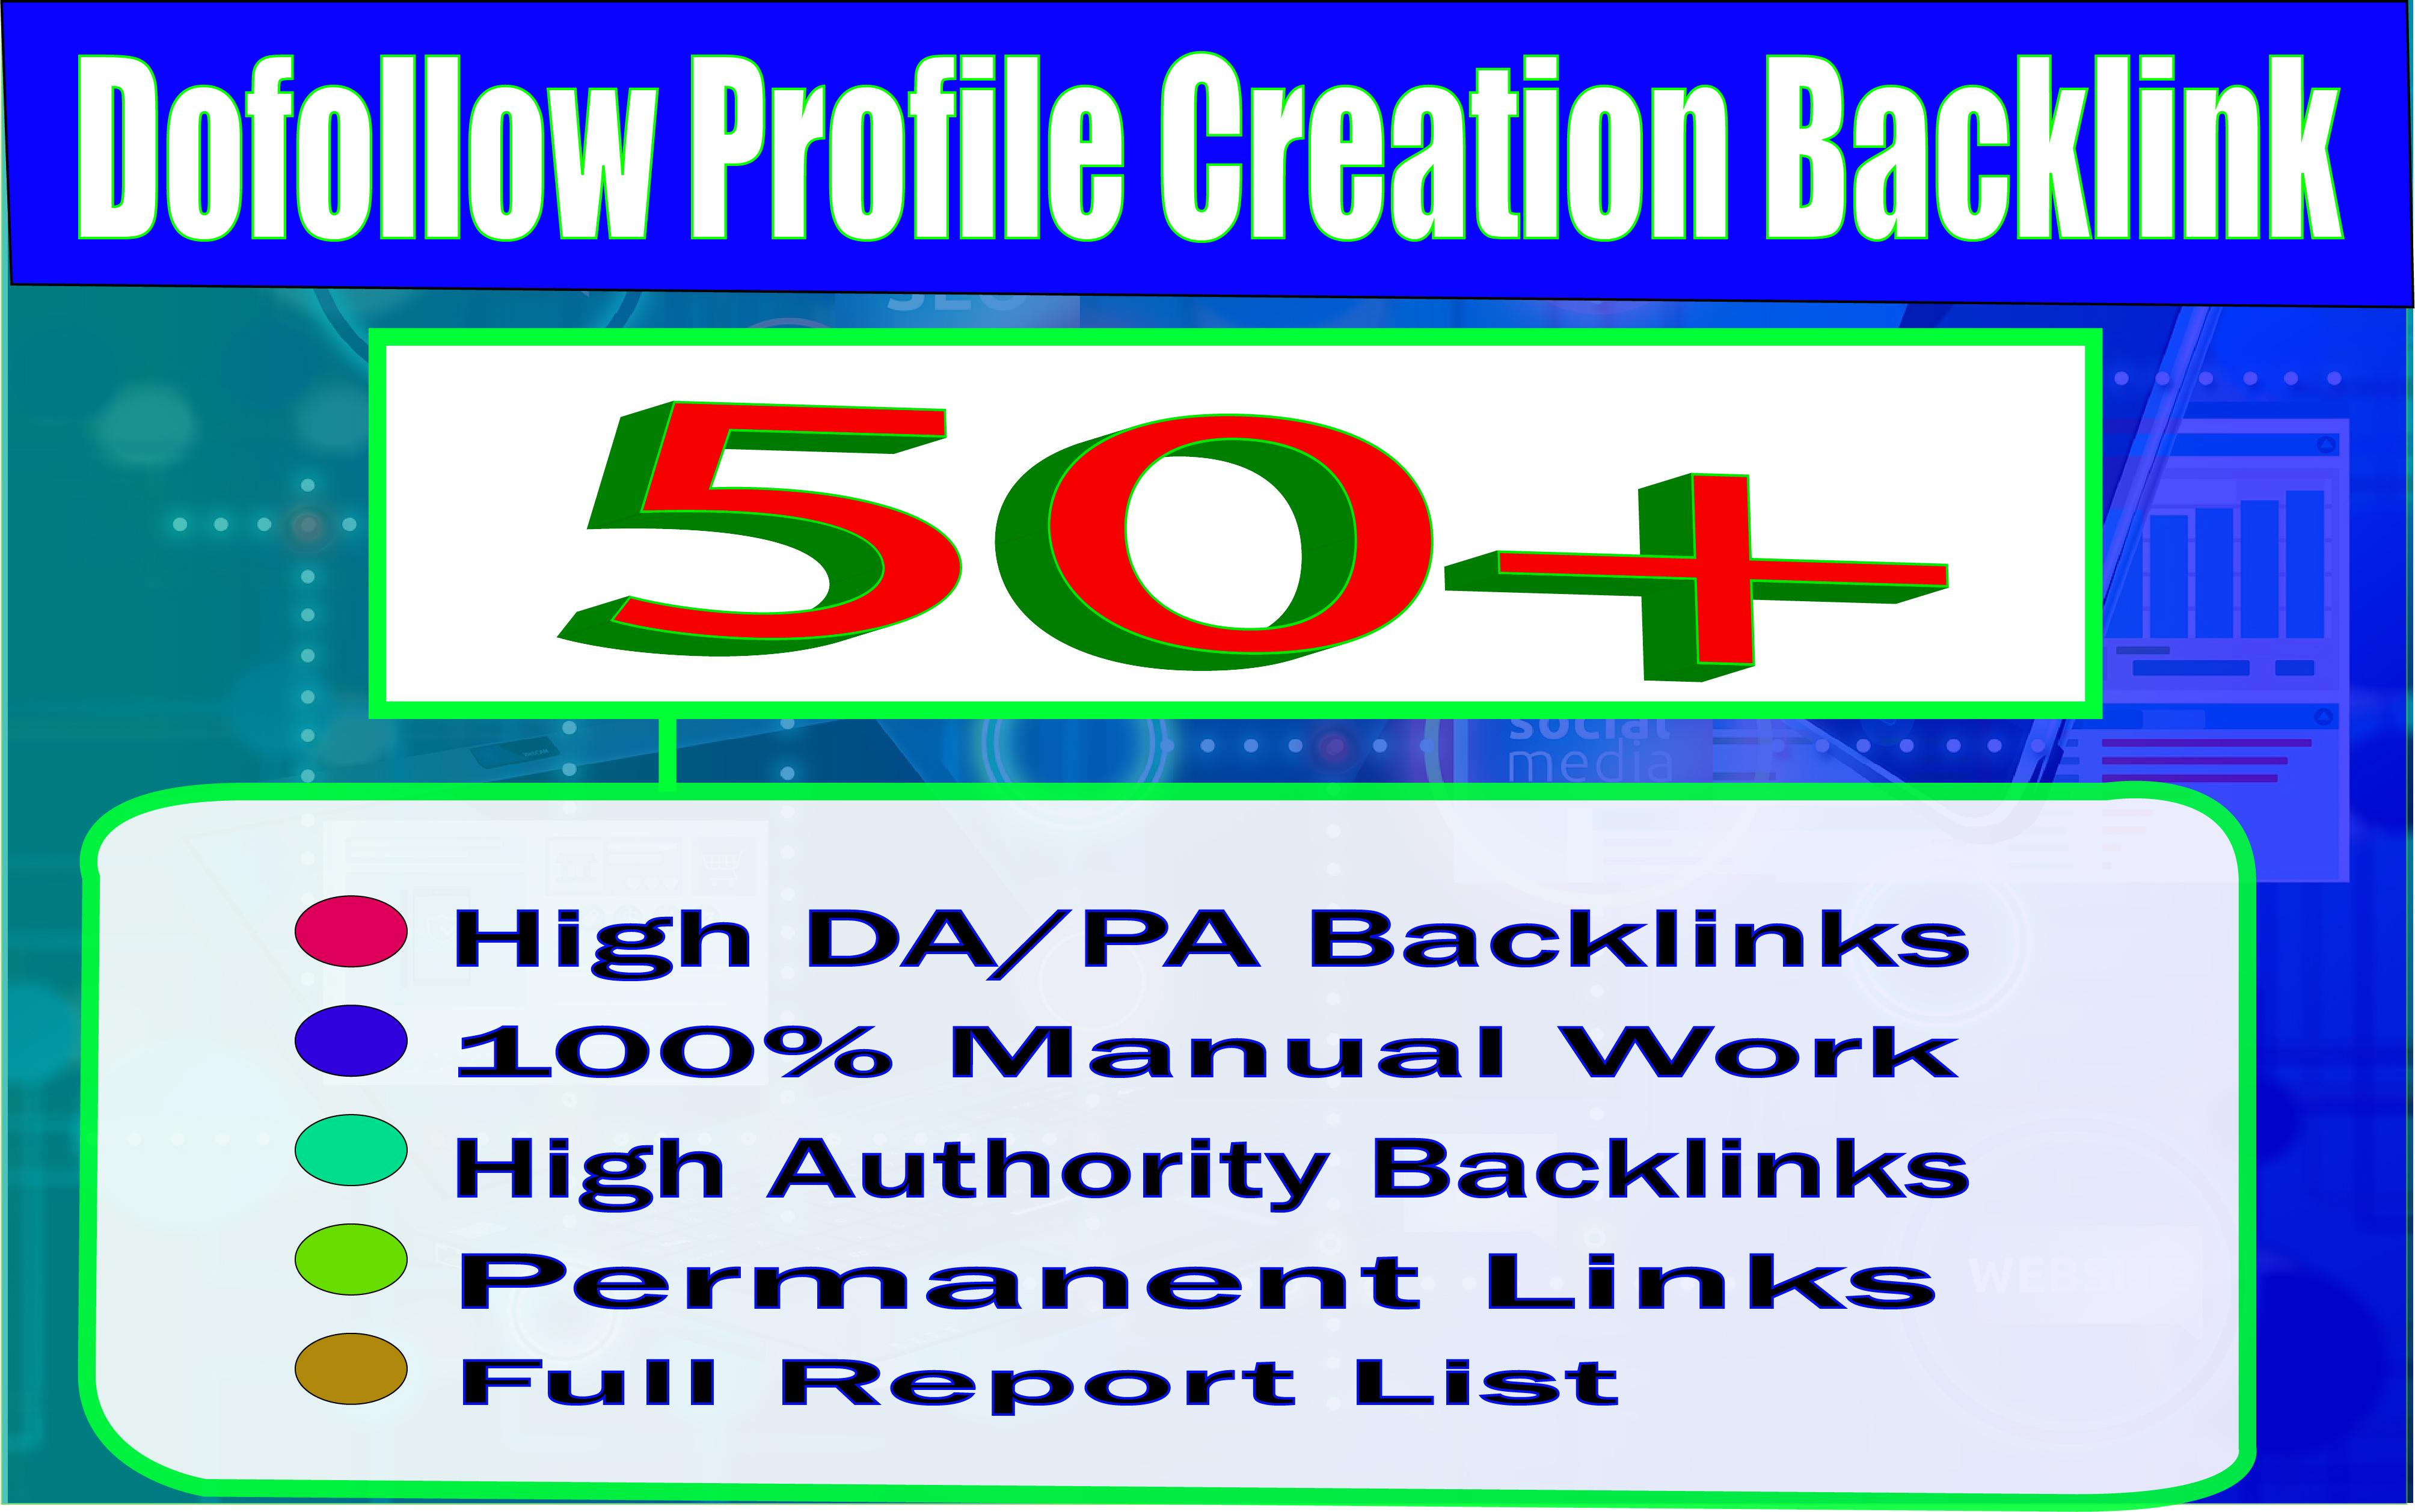 I will create 50 high DA 80+ & PA 80+ full Dofollow PR9 Profile Backlinks